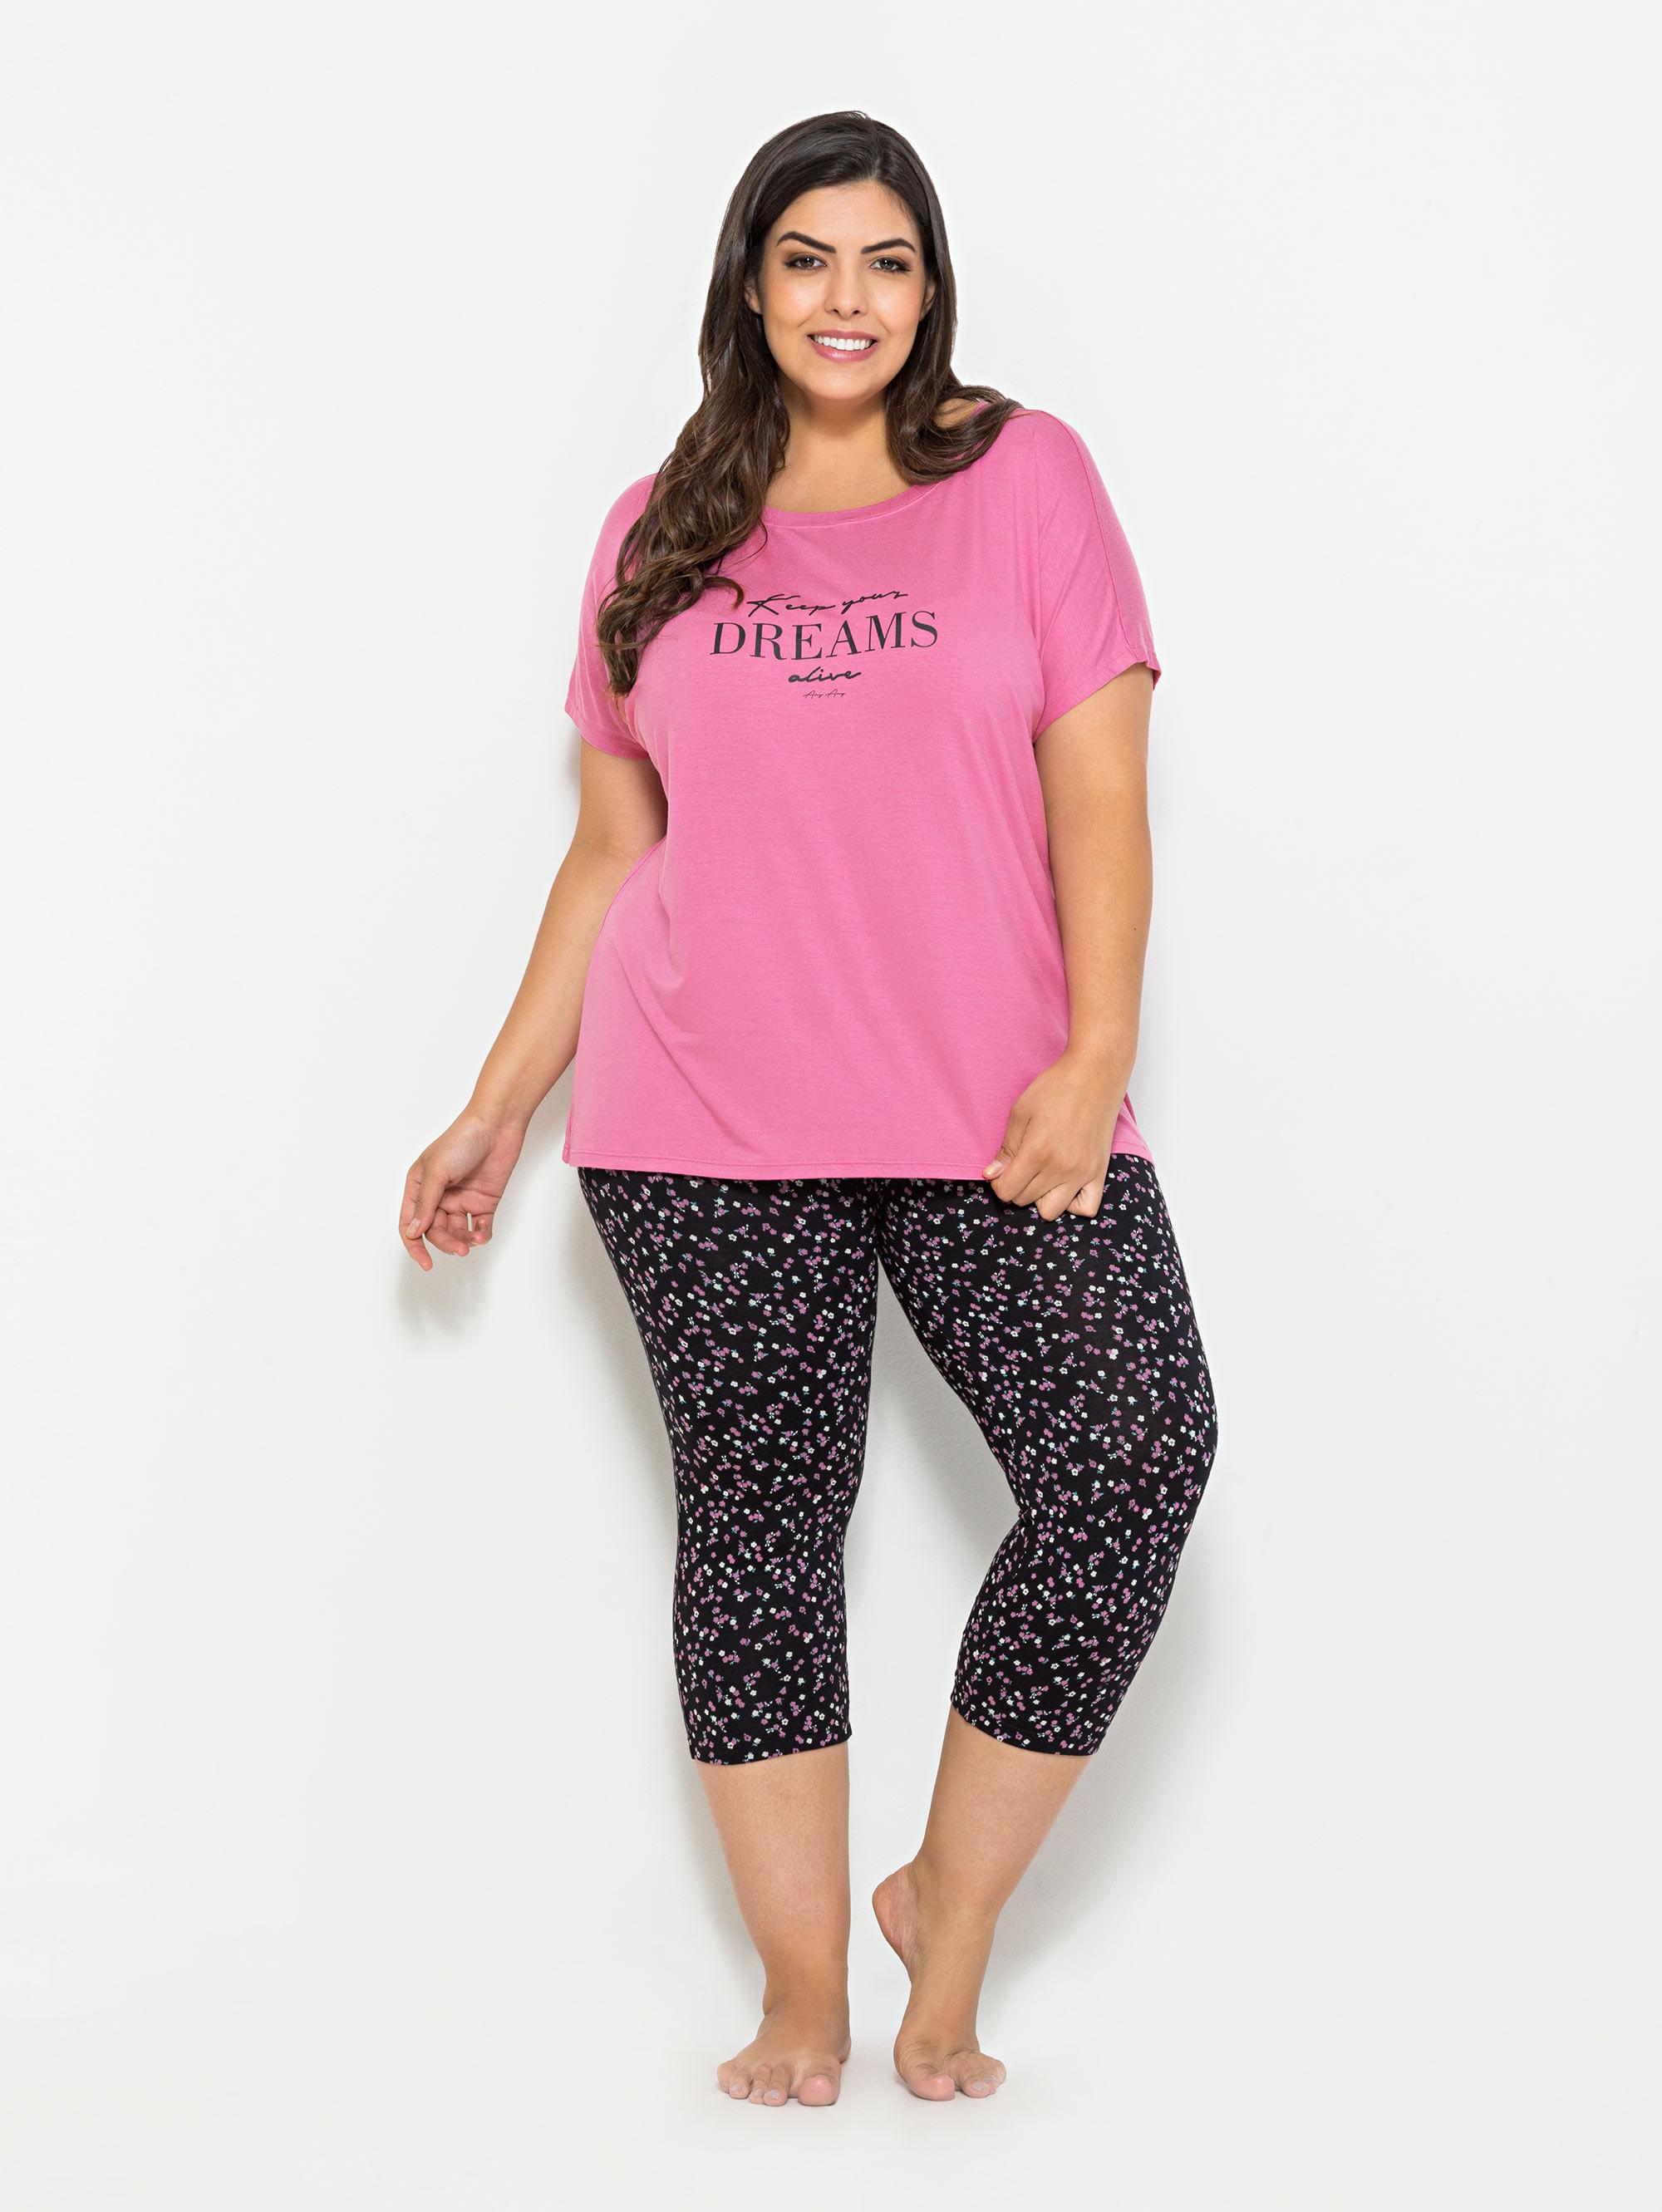 Pijama-Manga-Curta-Capri-Plus-Size-Feminino-Black-Flower-04.03.0610